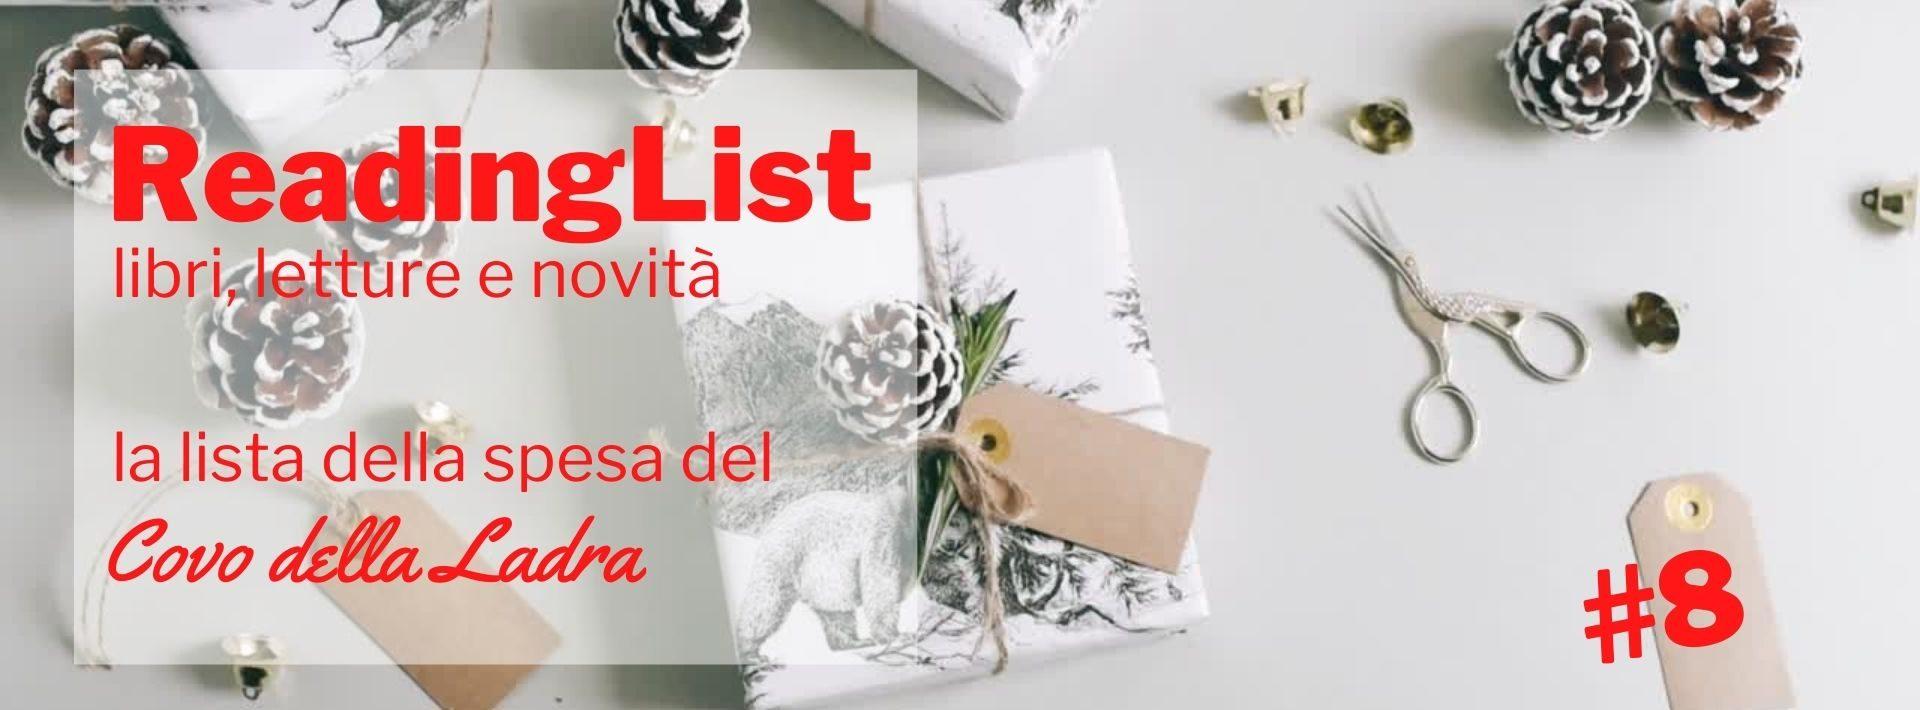 Reading list #8